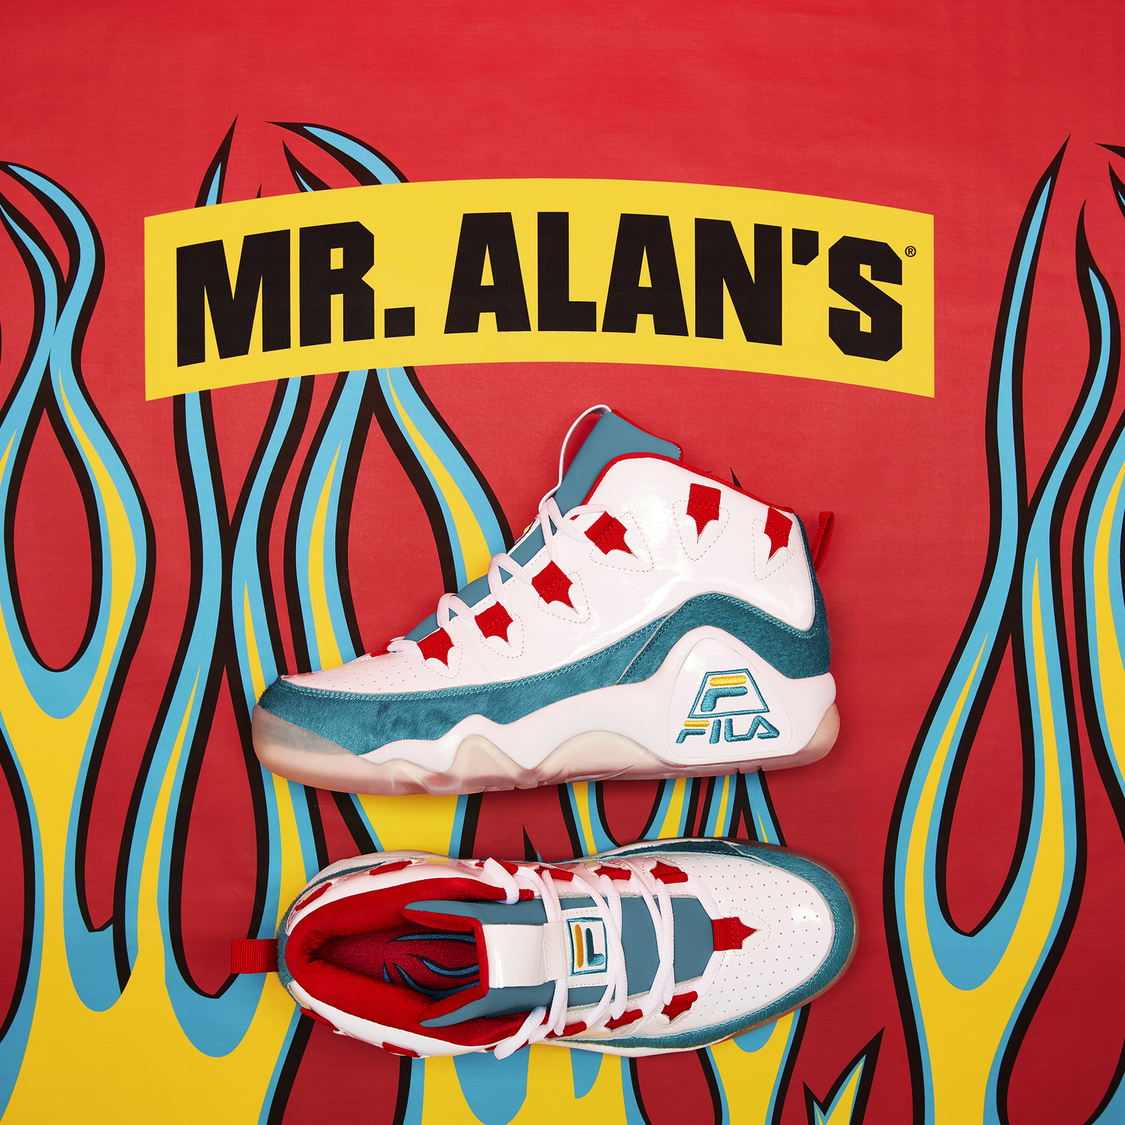 Fila-95-x-Mr-Alans-2